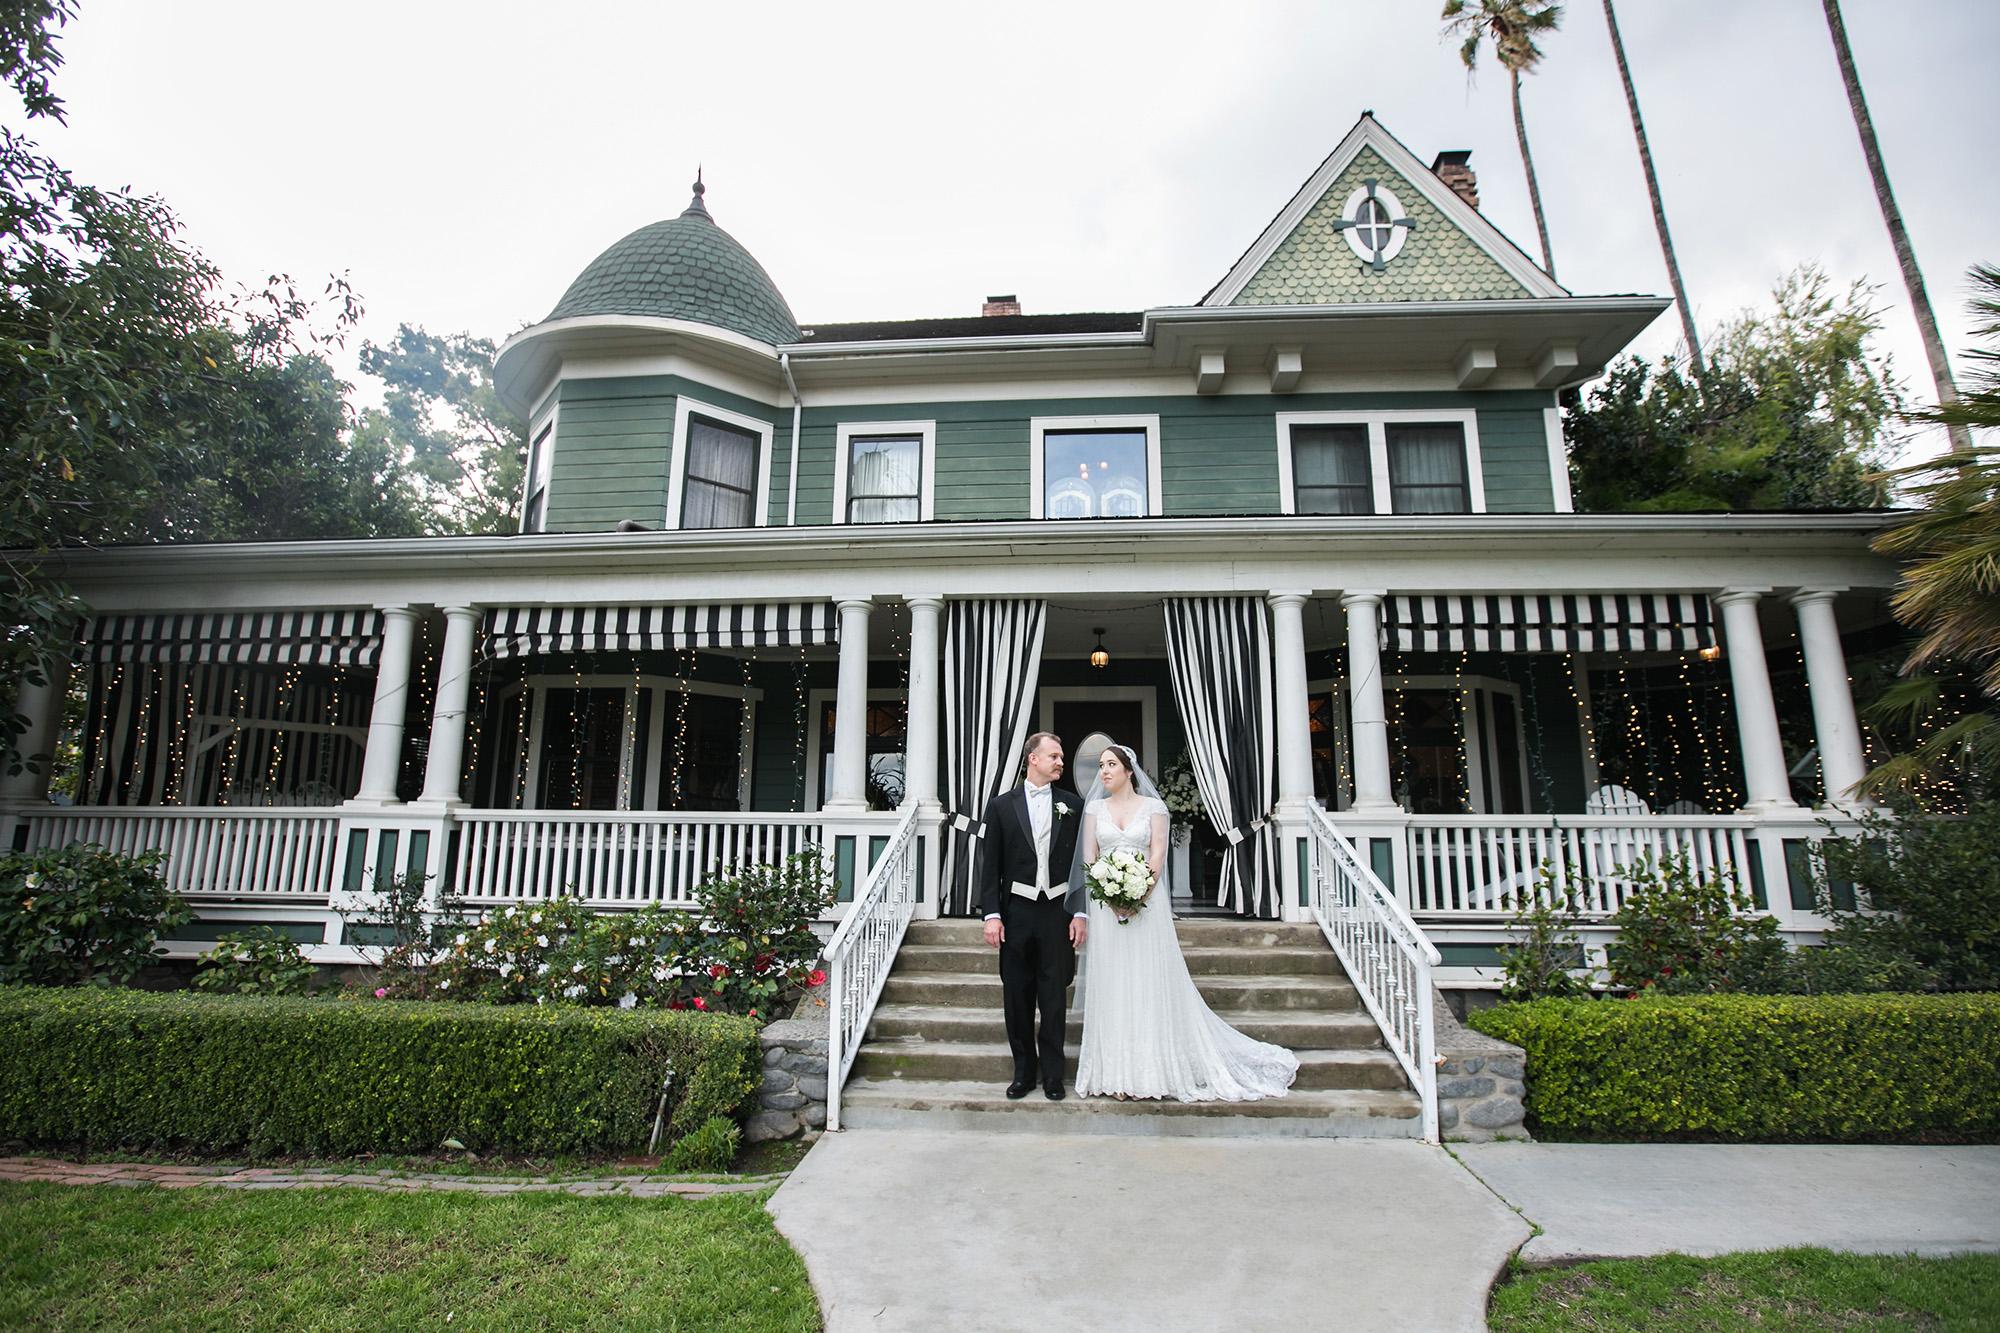 vintage-inspired-christmas-house-wedding-carrie-vines-064.jpg